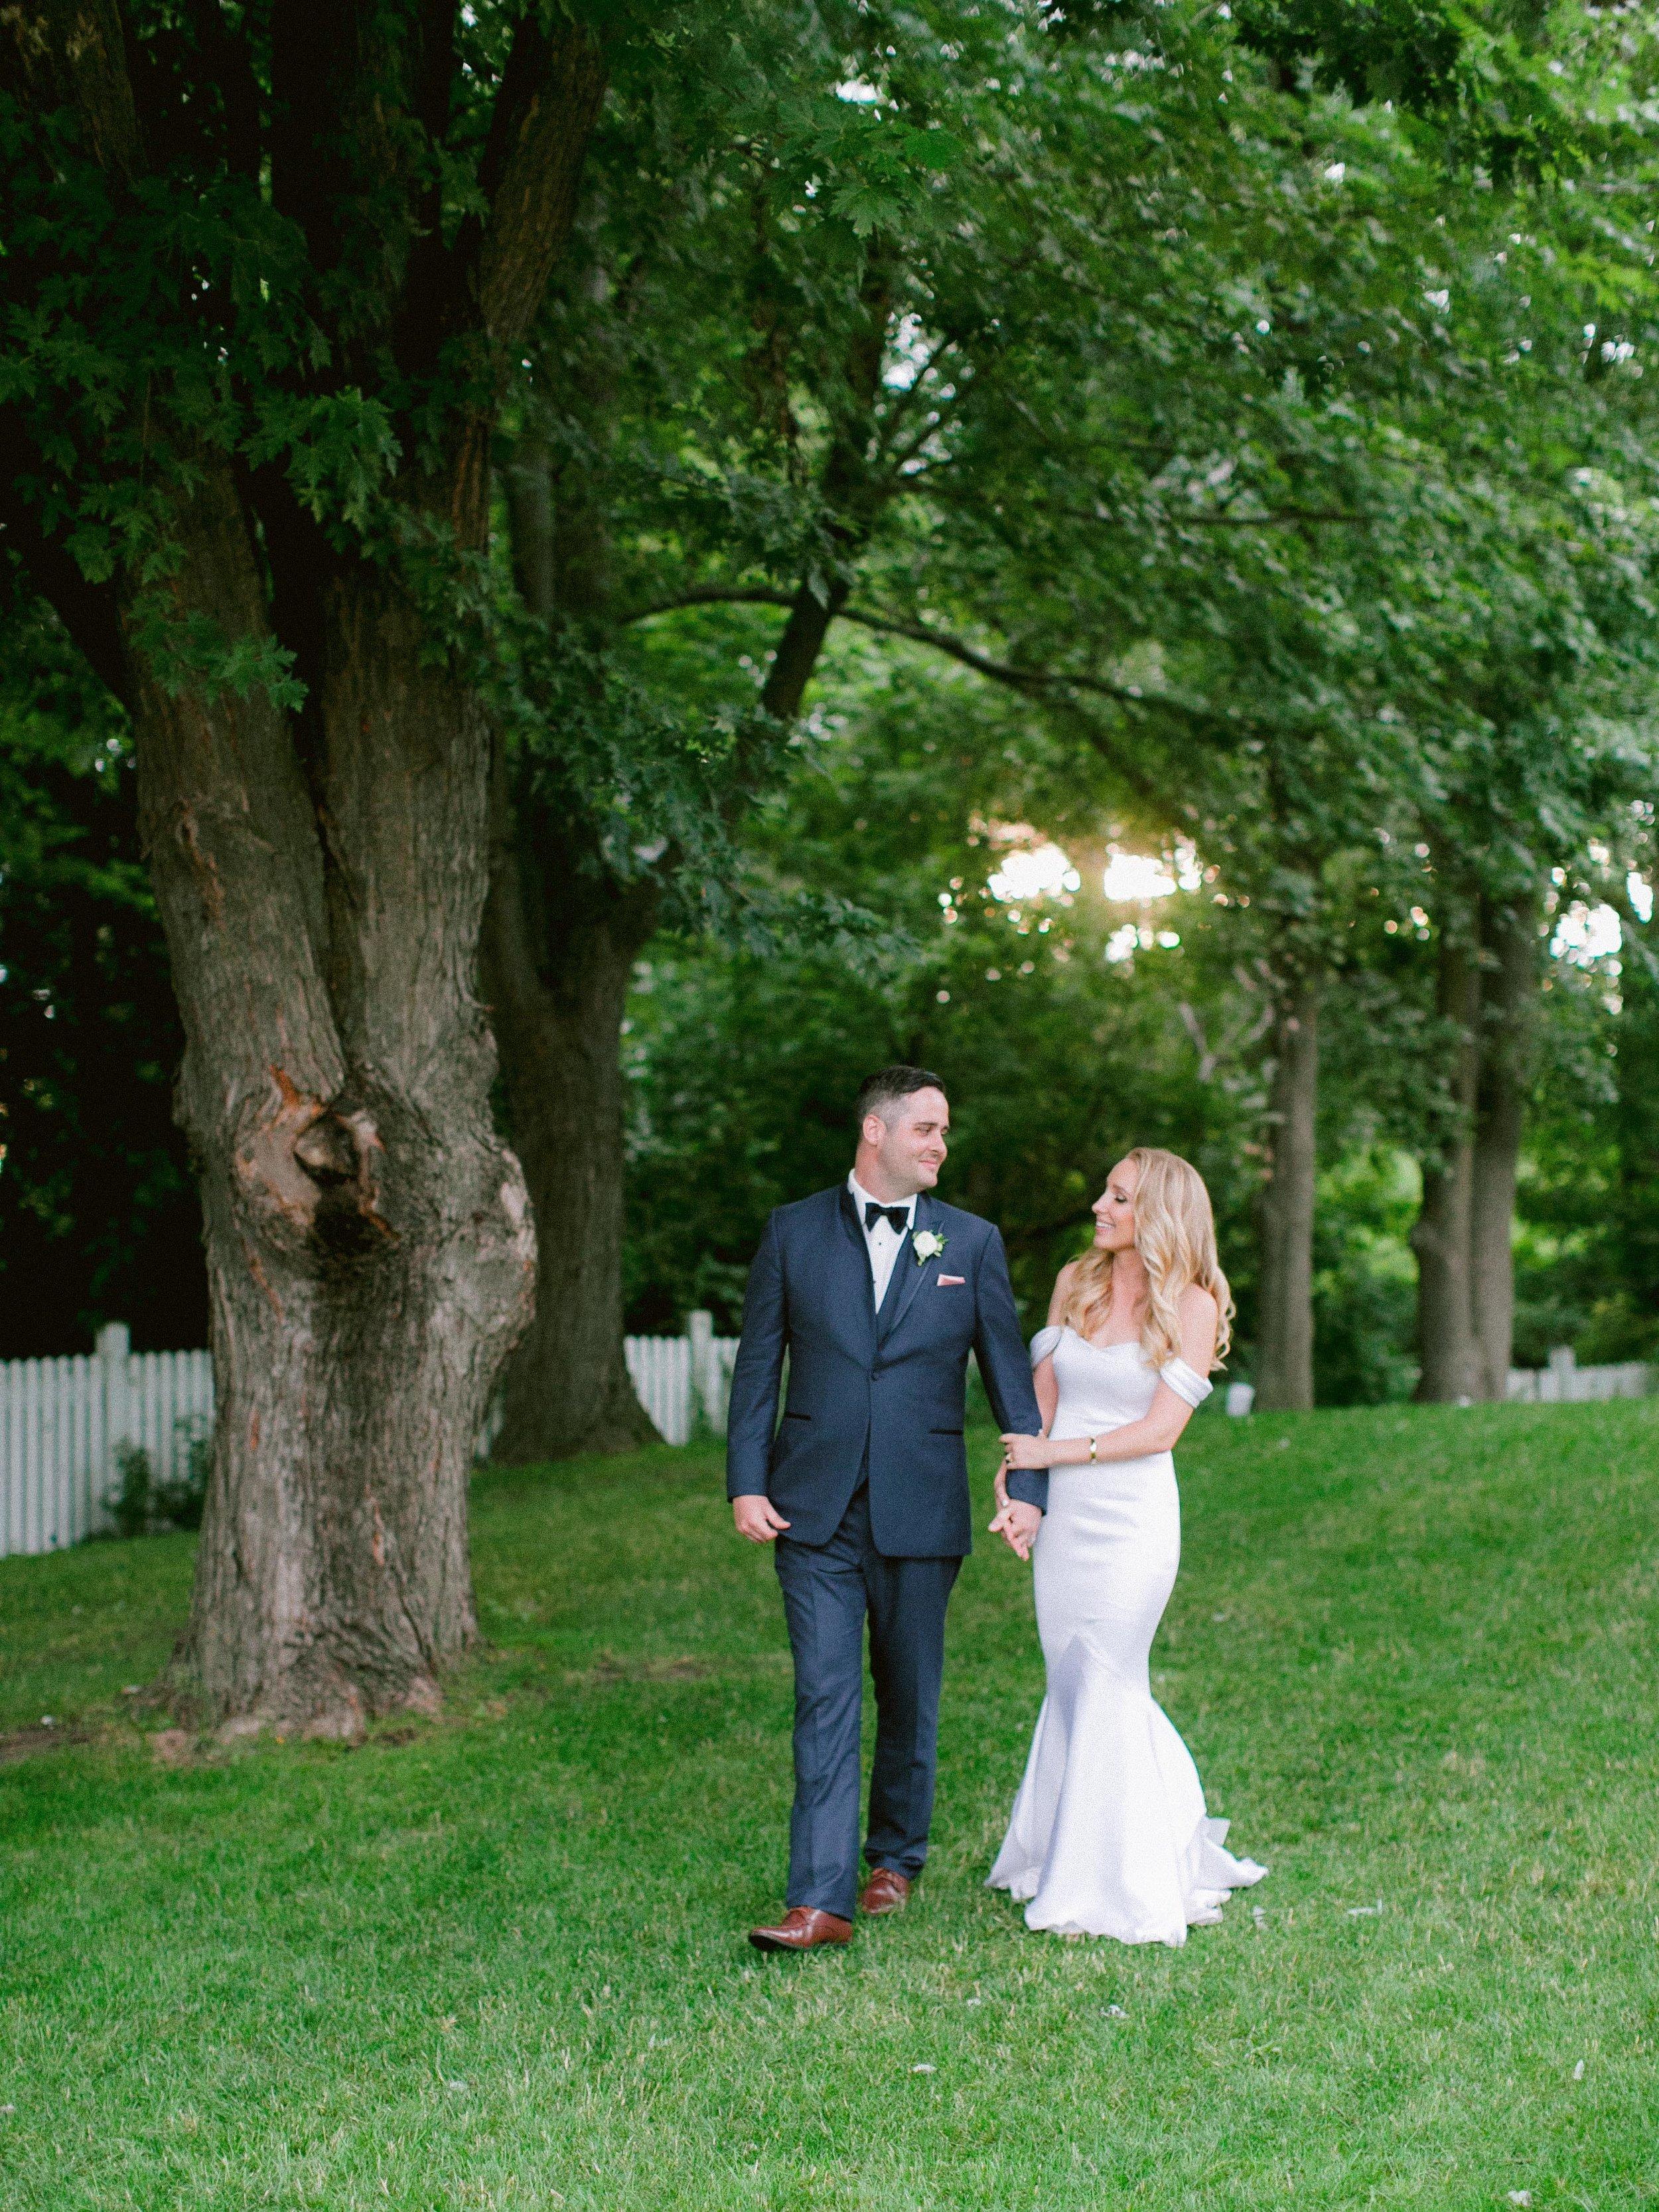 Summer_Engagament_Session_Toronto_Niagara_Wedding_Photographer (3 of 3).jpg